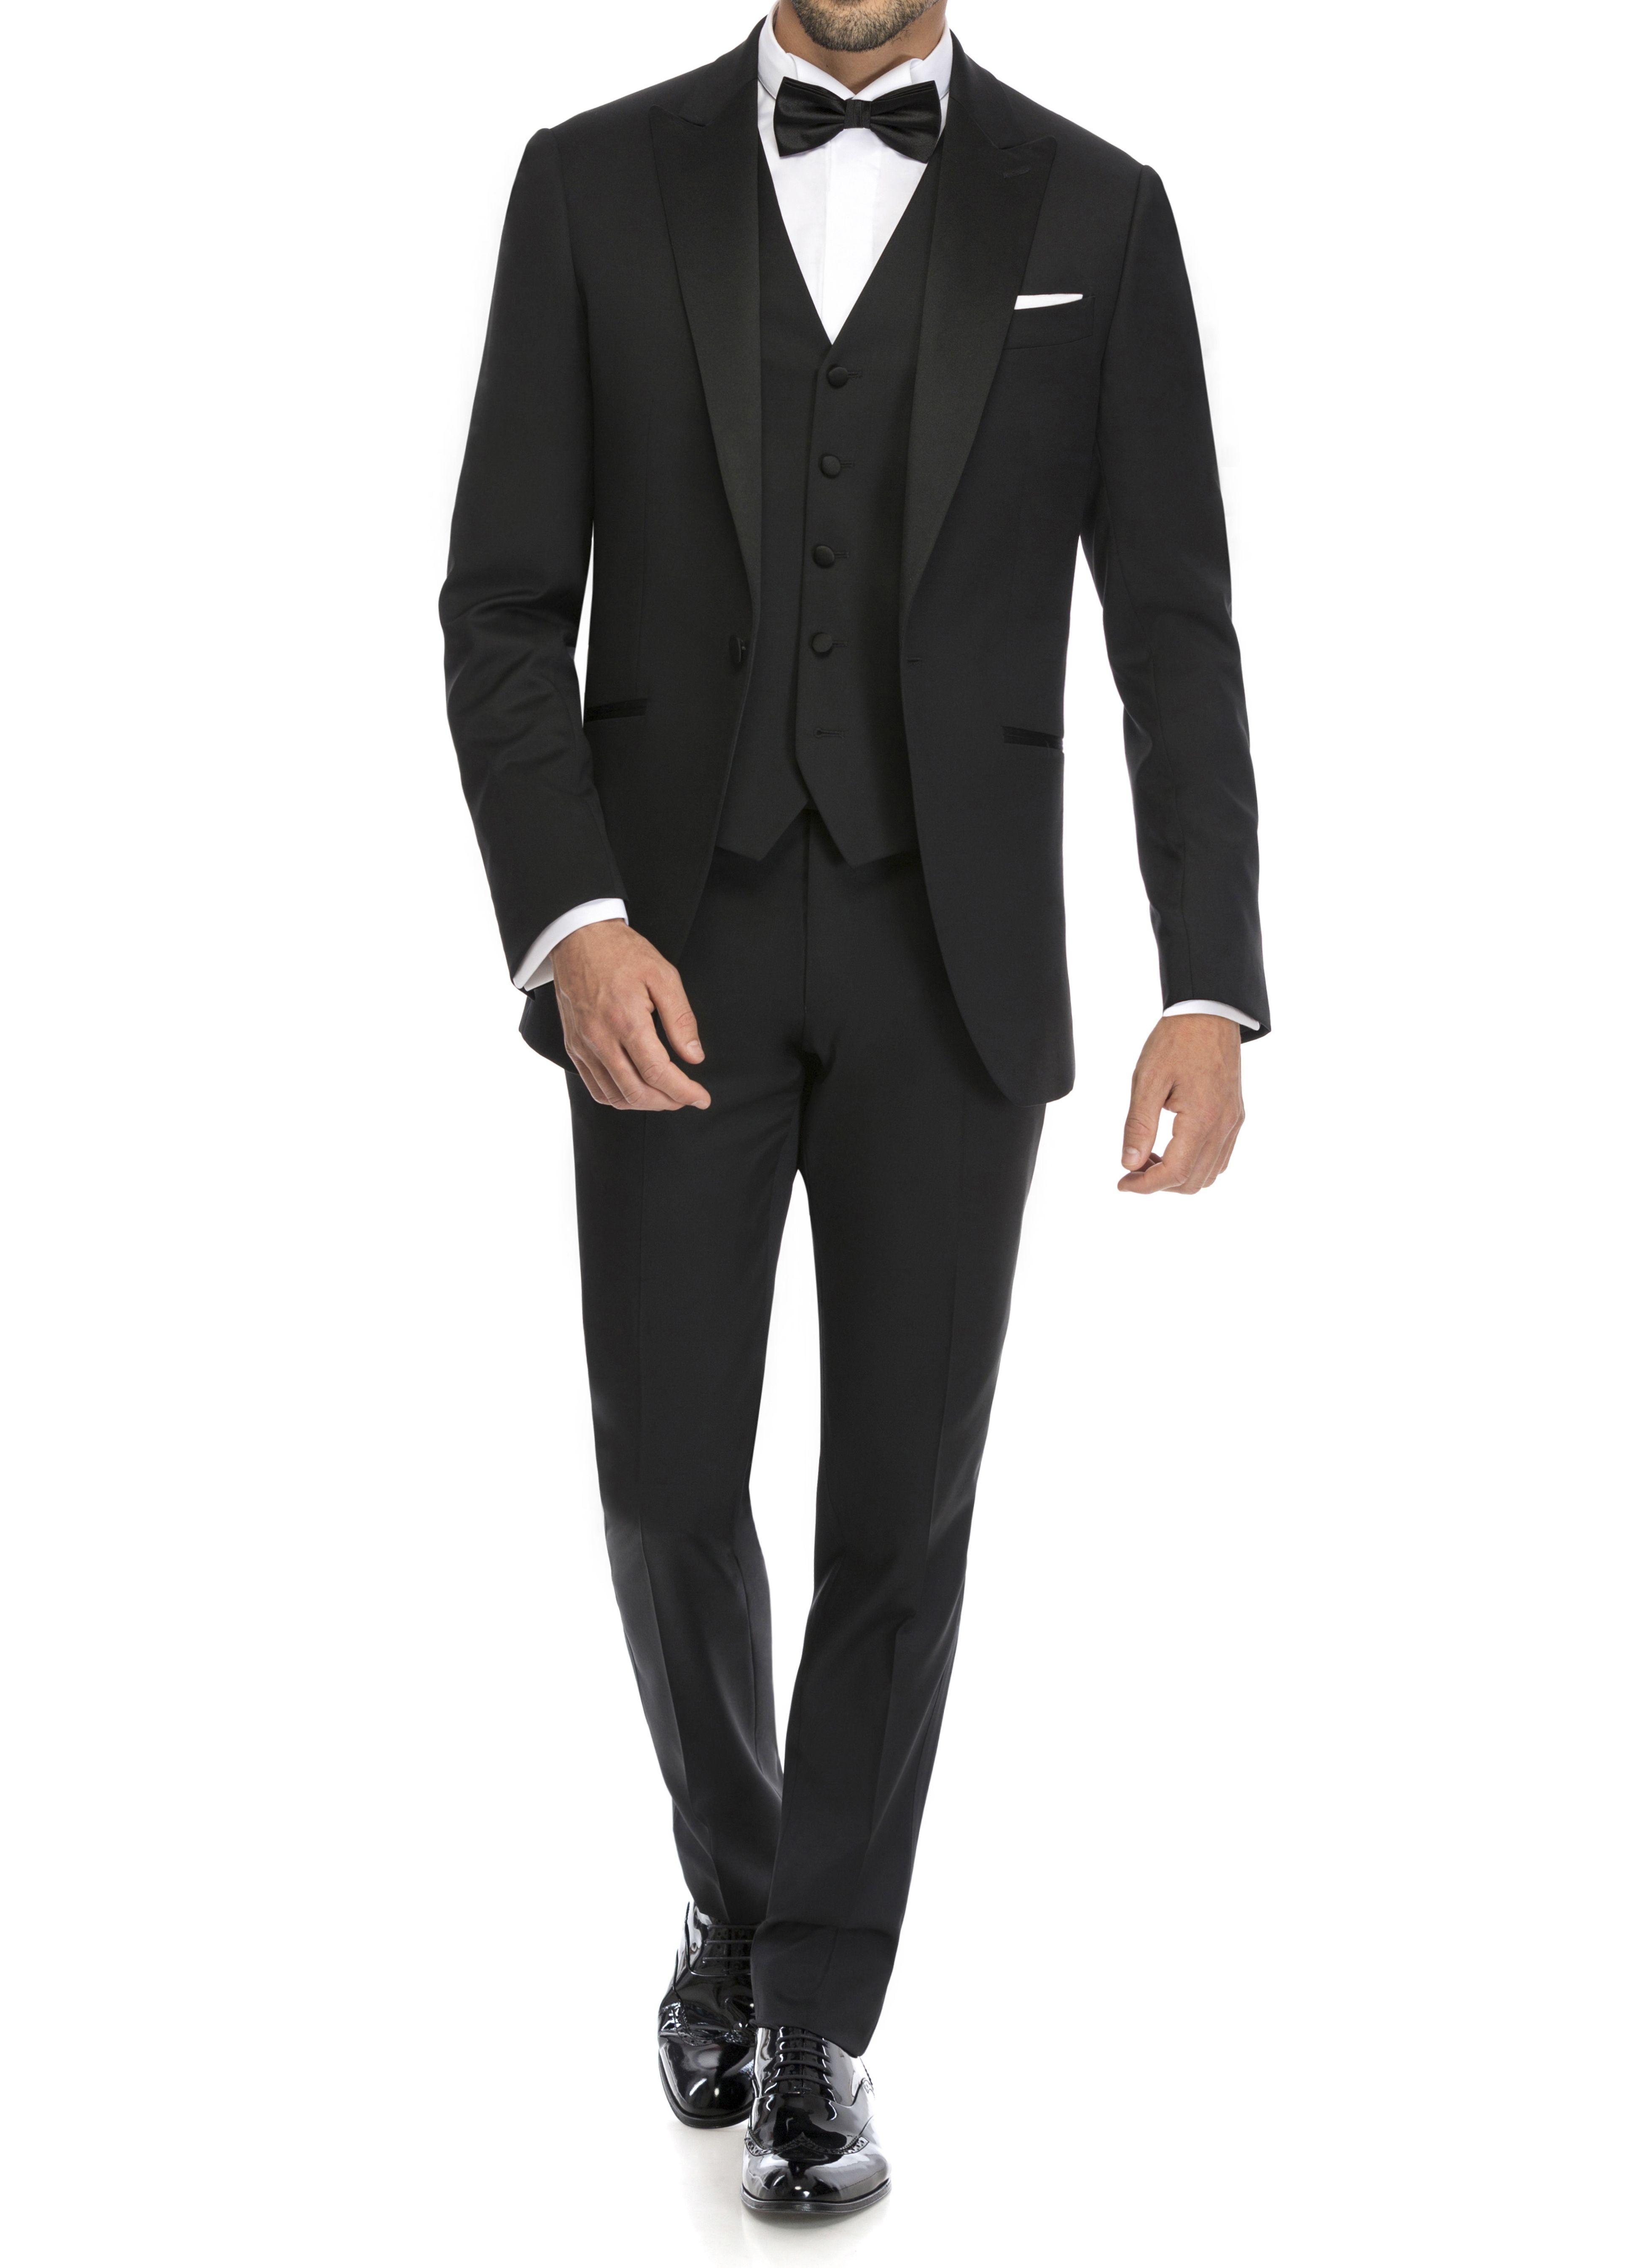 Cocktail Party Suit Part - 50: Perfect #suit For Your Next #party, #reception #cocktailparty . #parties